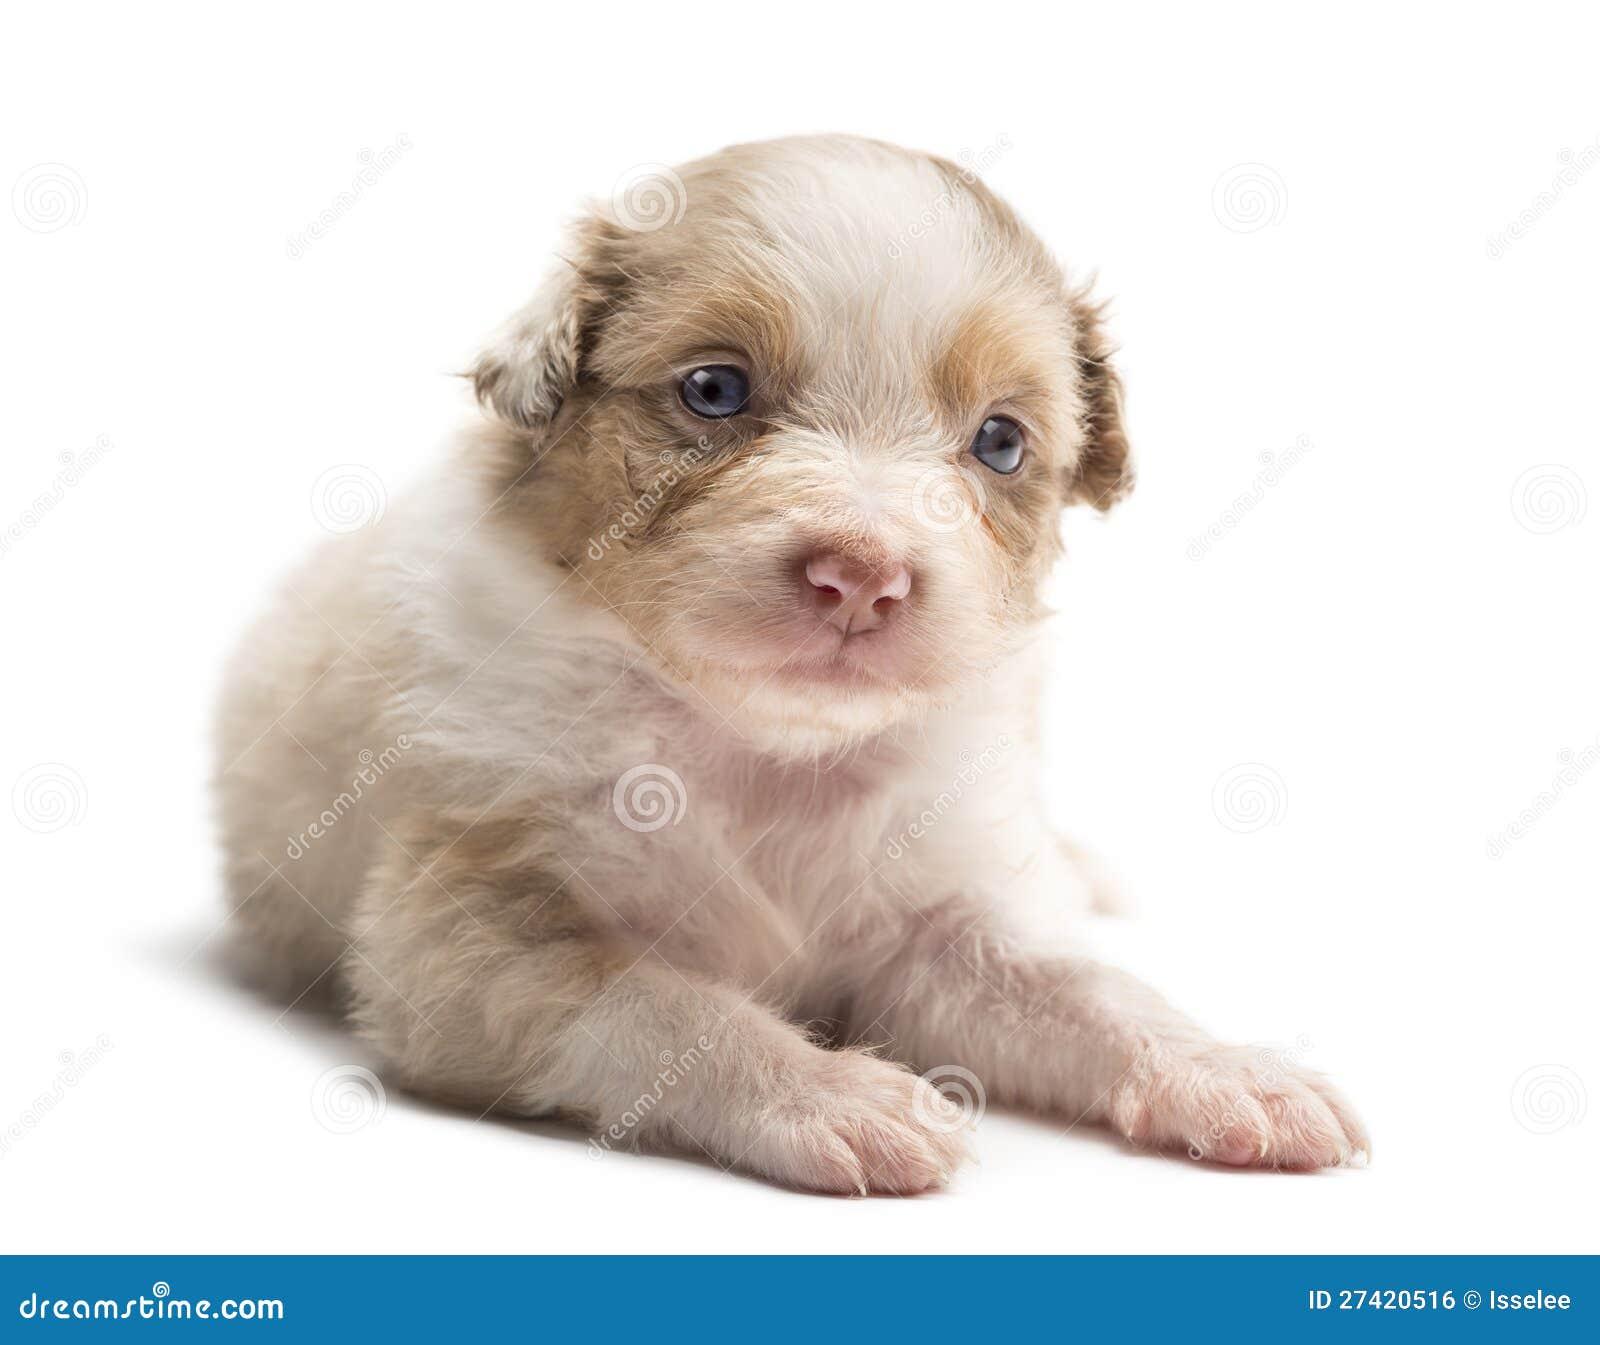 Royalty Free Stock Image: Australian Shepherd puppy, 24 days old